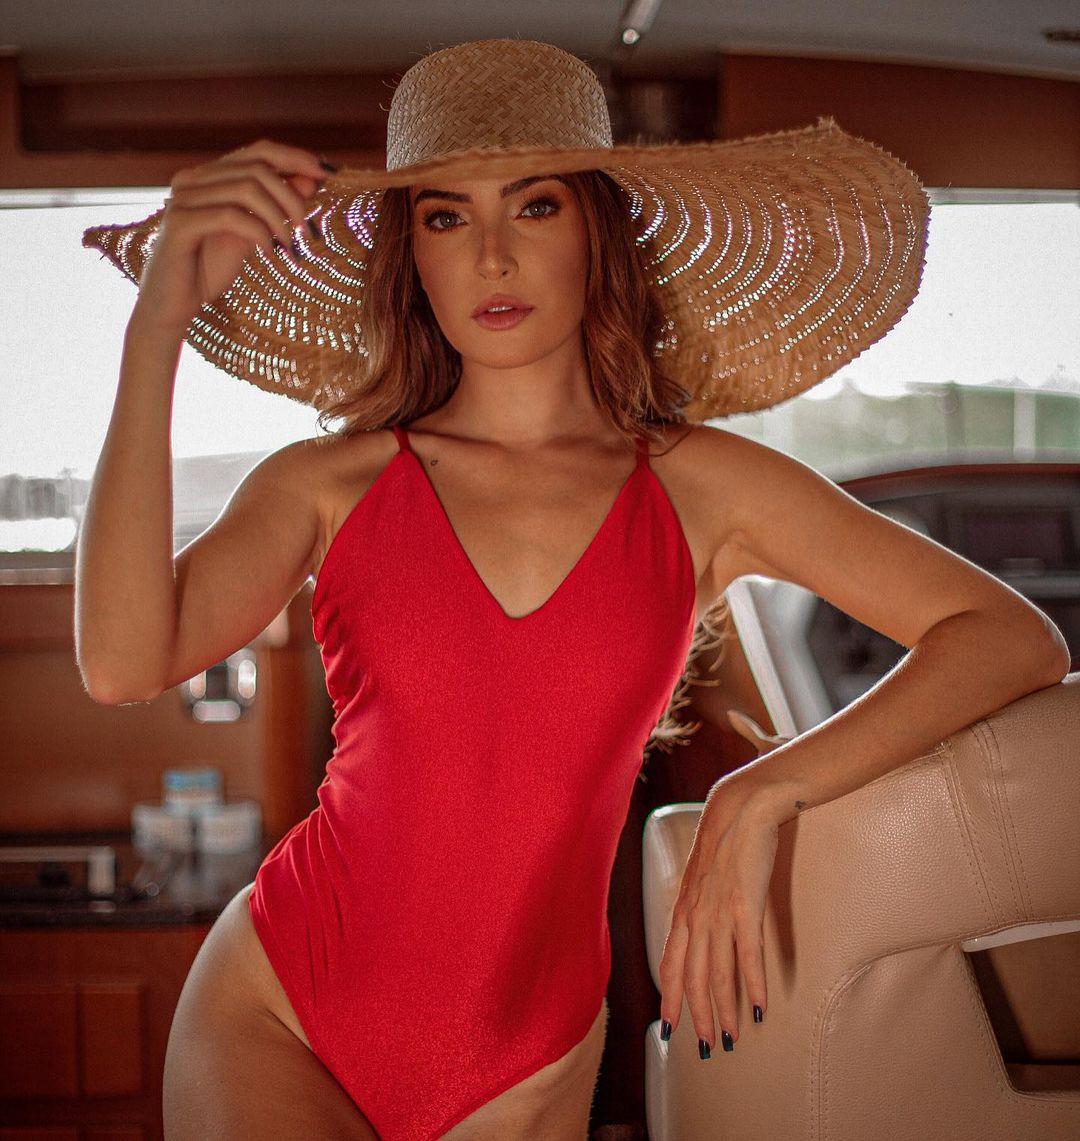 anne karoline lisboa, miss simpatia de miss brasil mundo 2019. 13264912